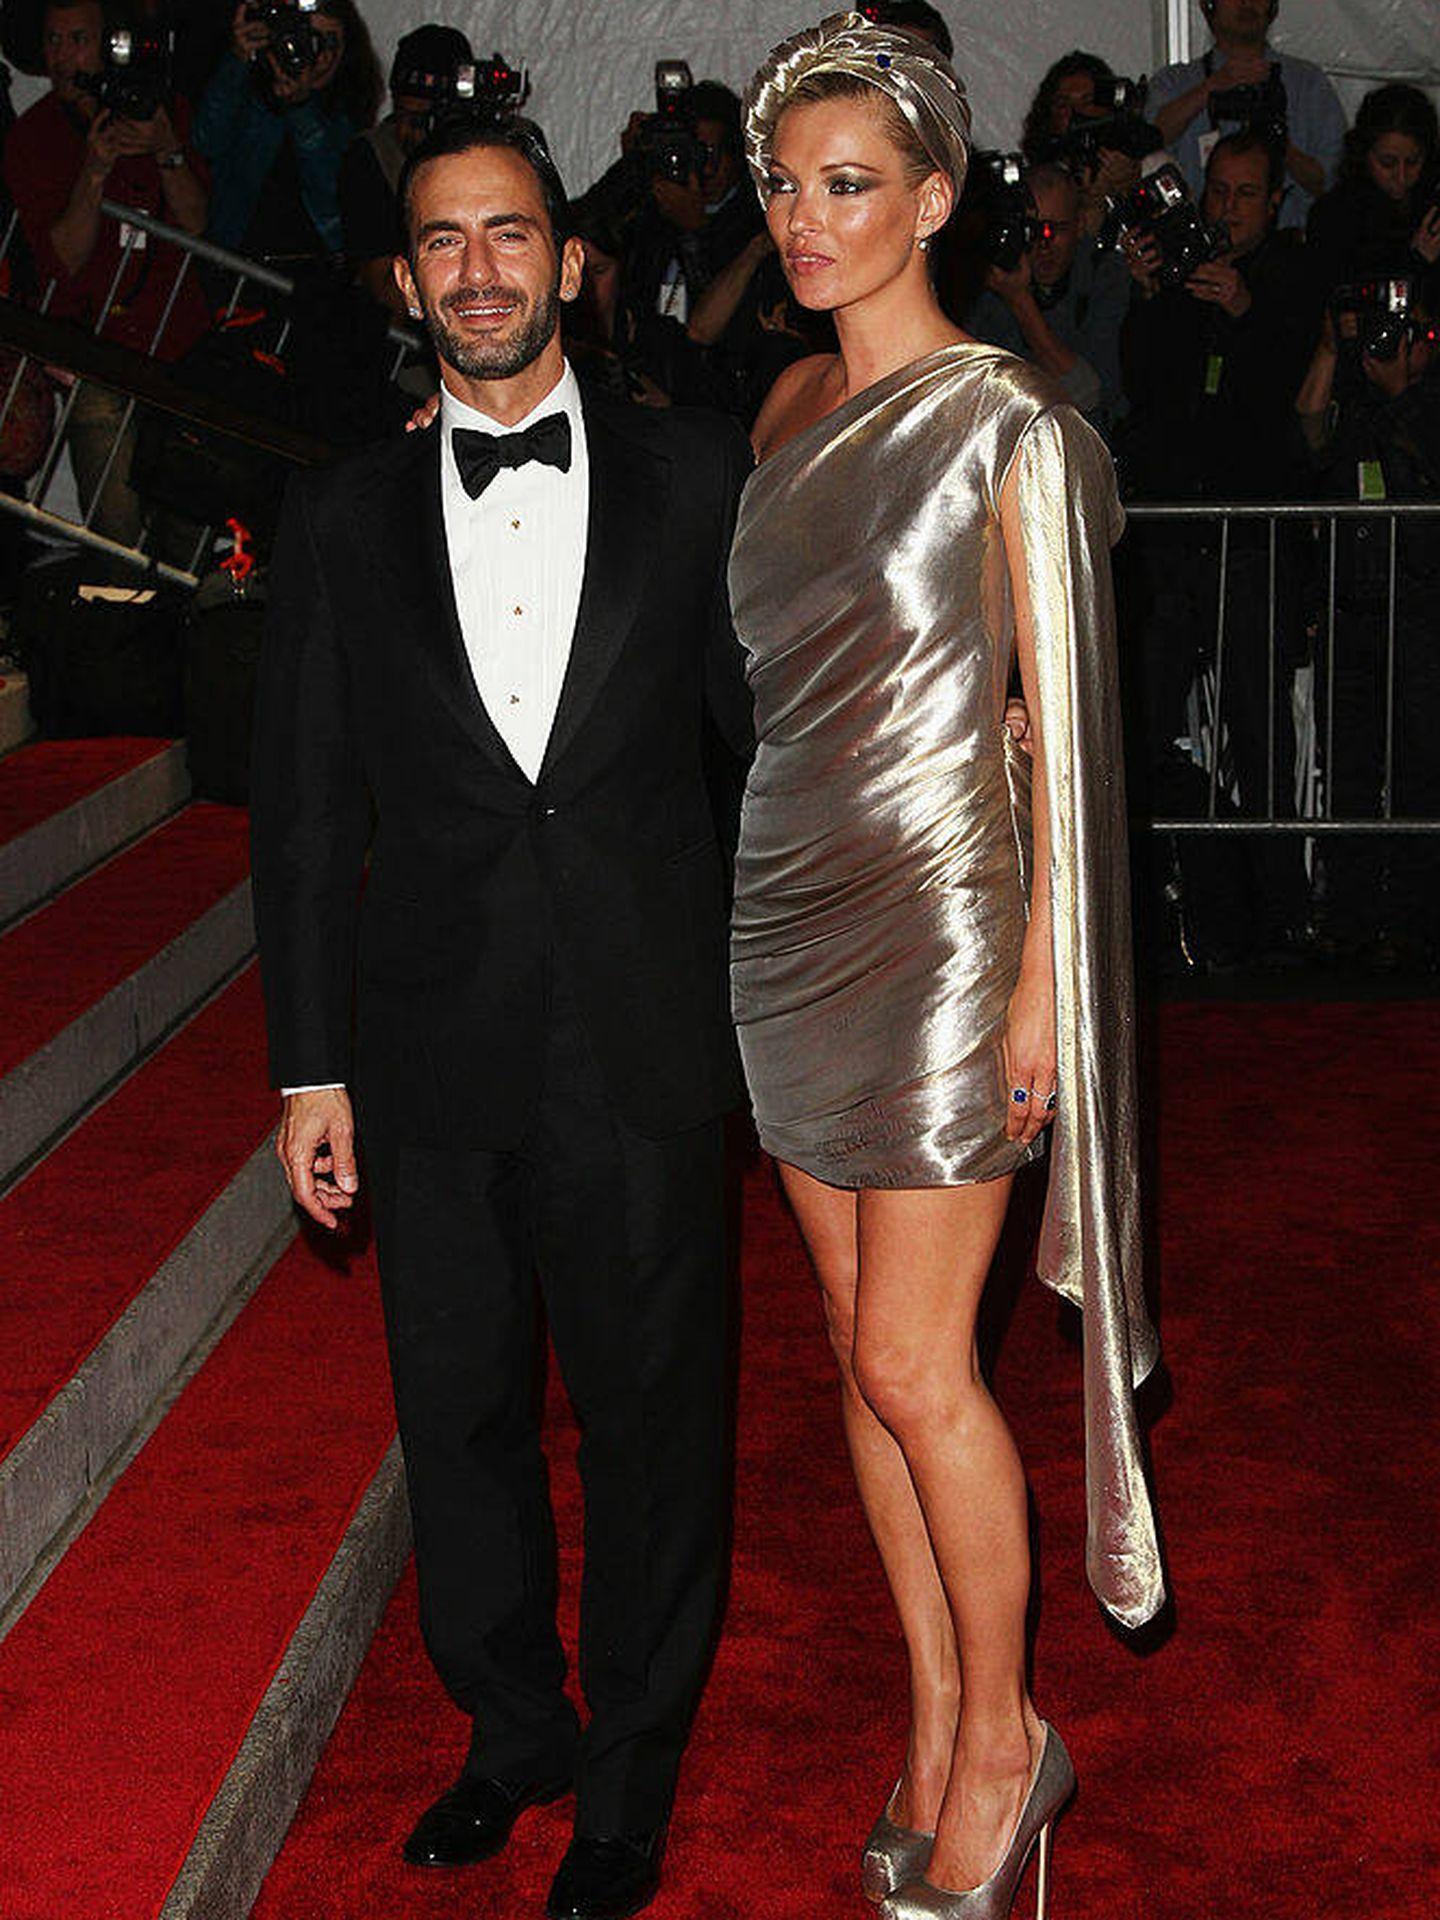 Kate Moss y Marc Jacobs, en la gala del MET 2009. (Getty)